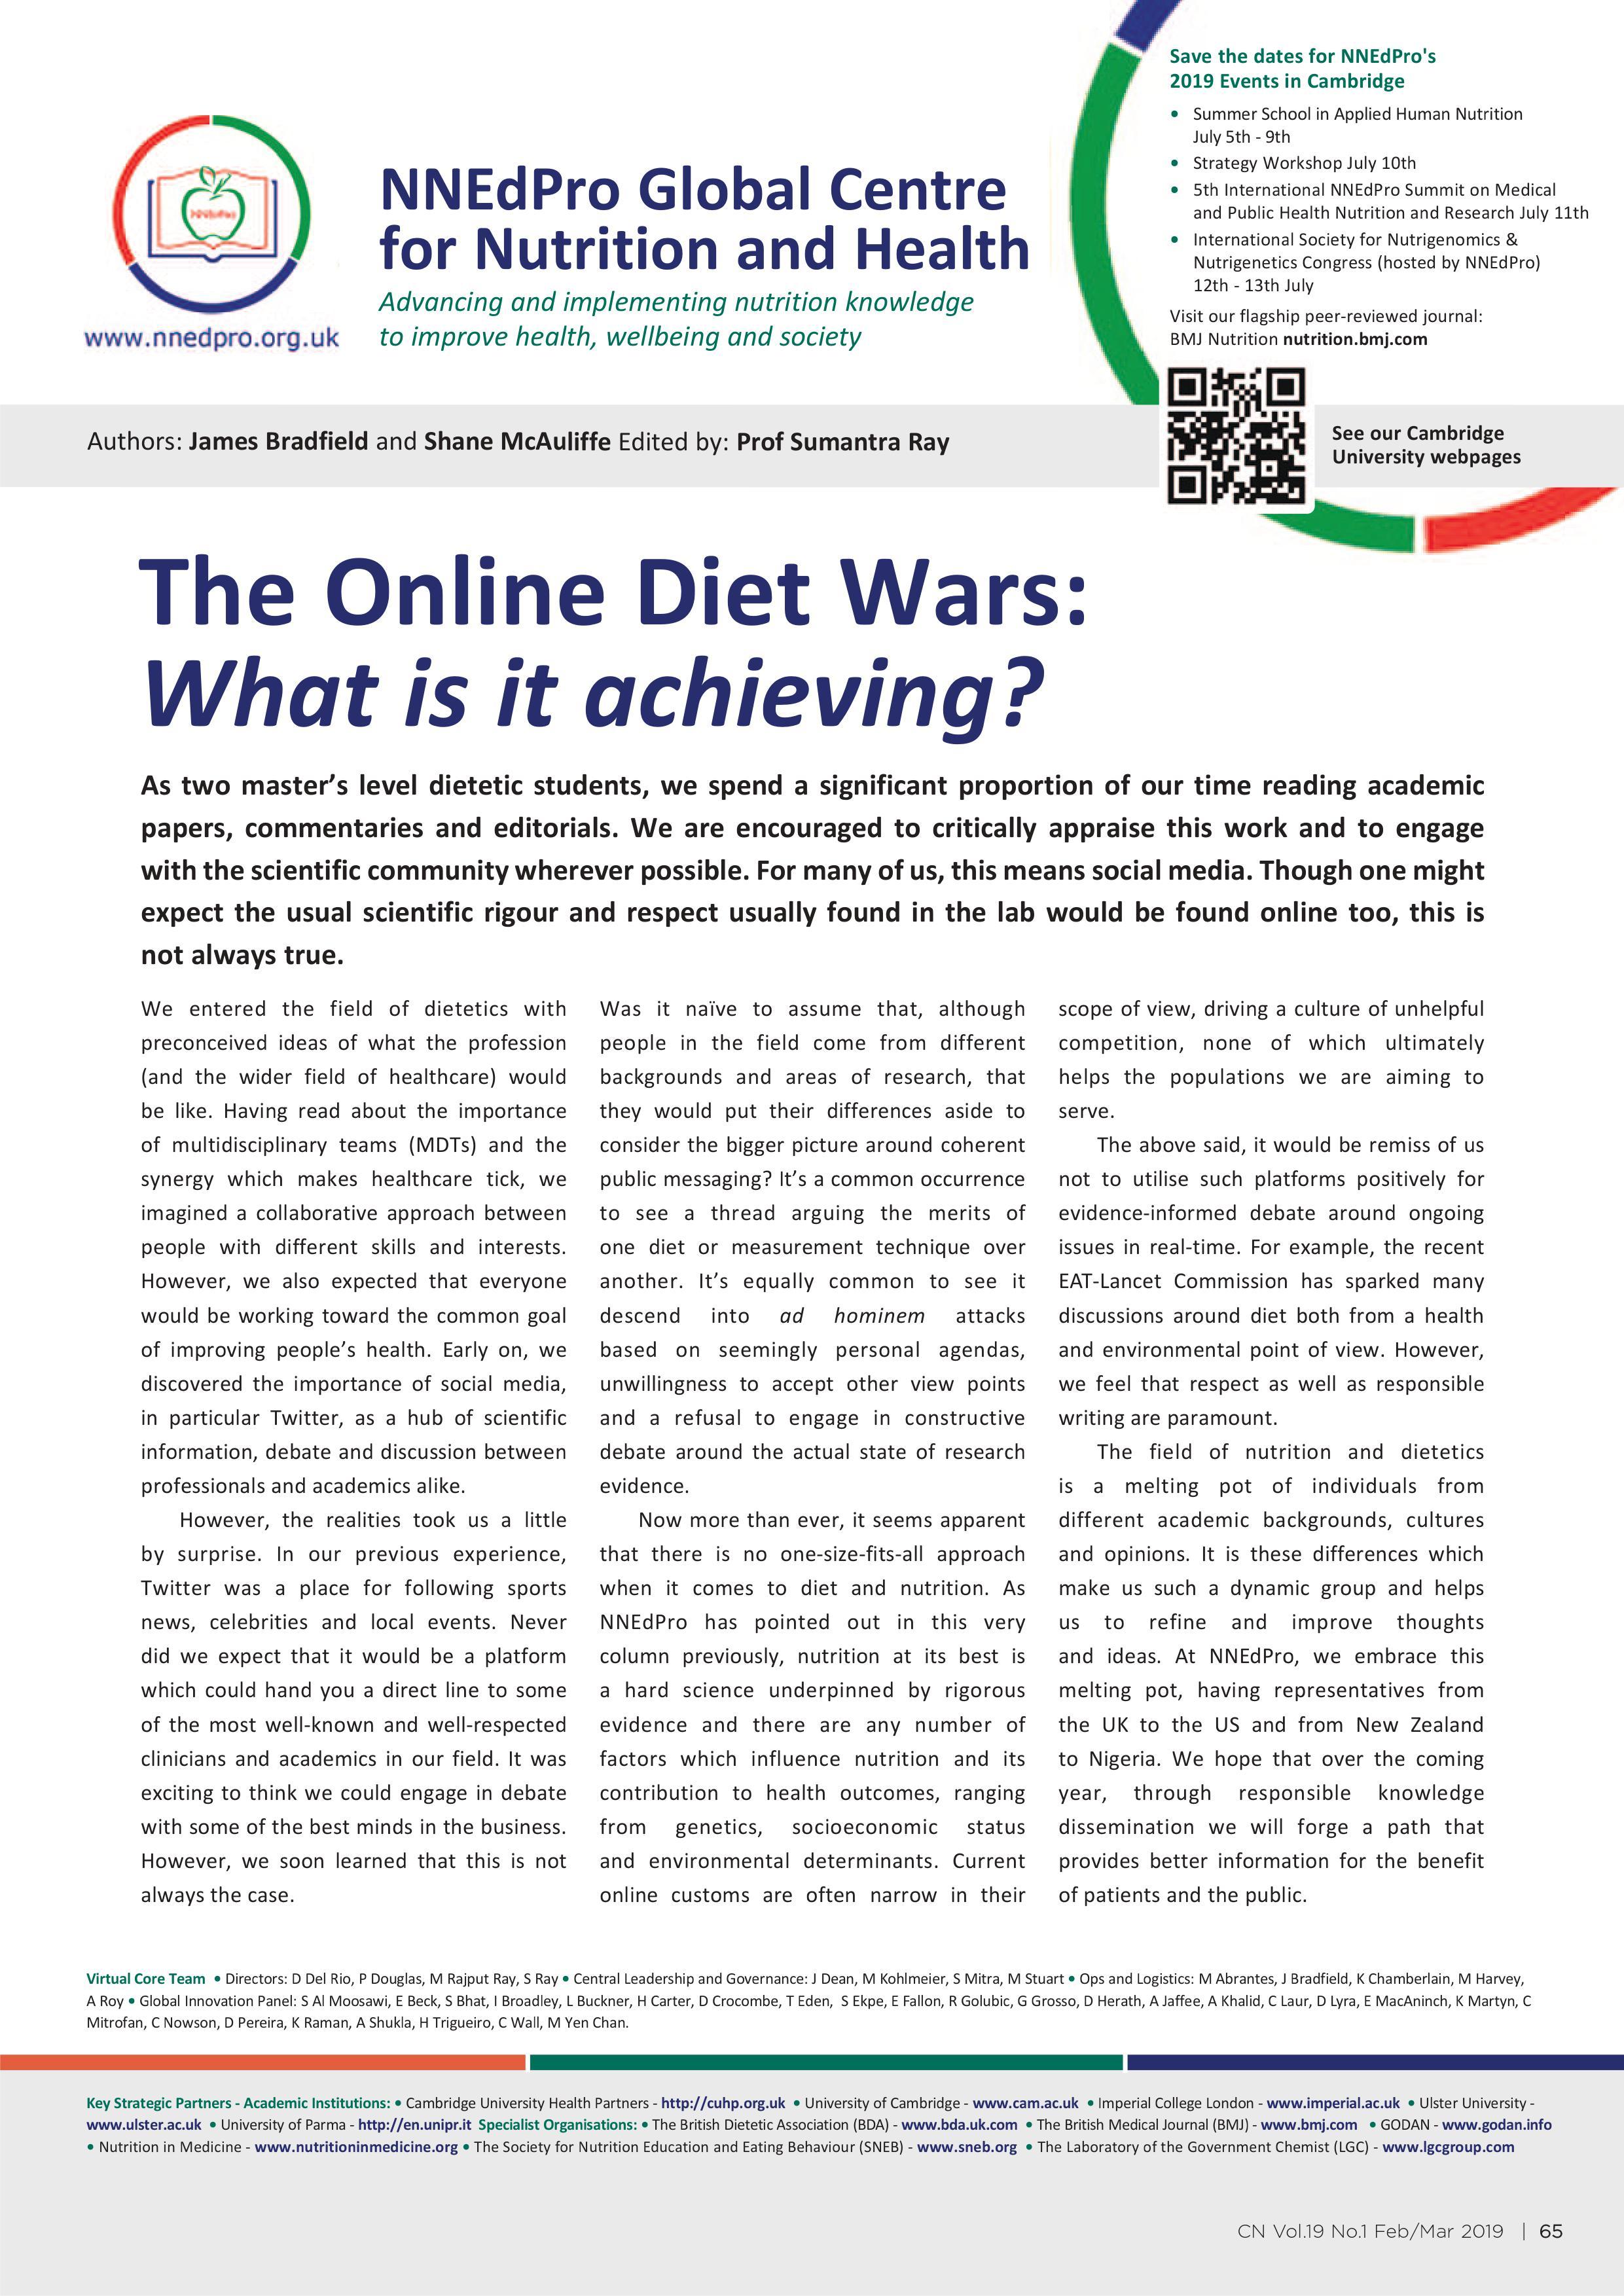 Online Diet Wars - NNEdPro article in CN